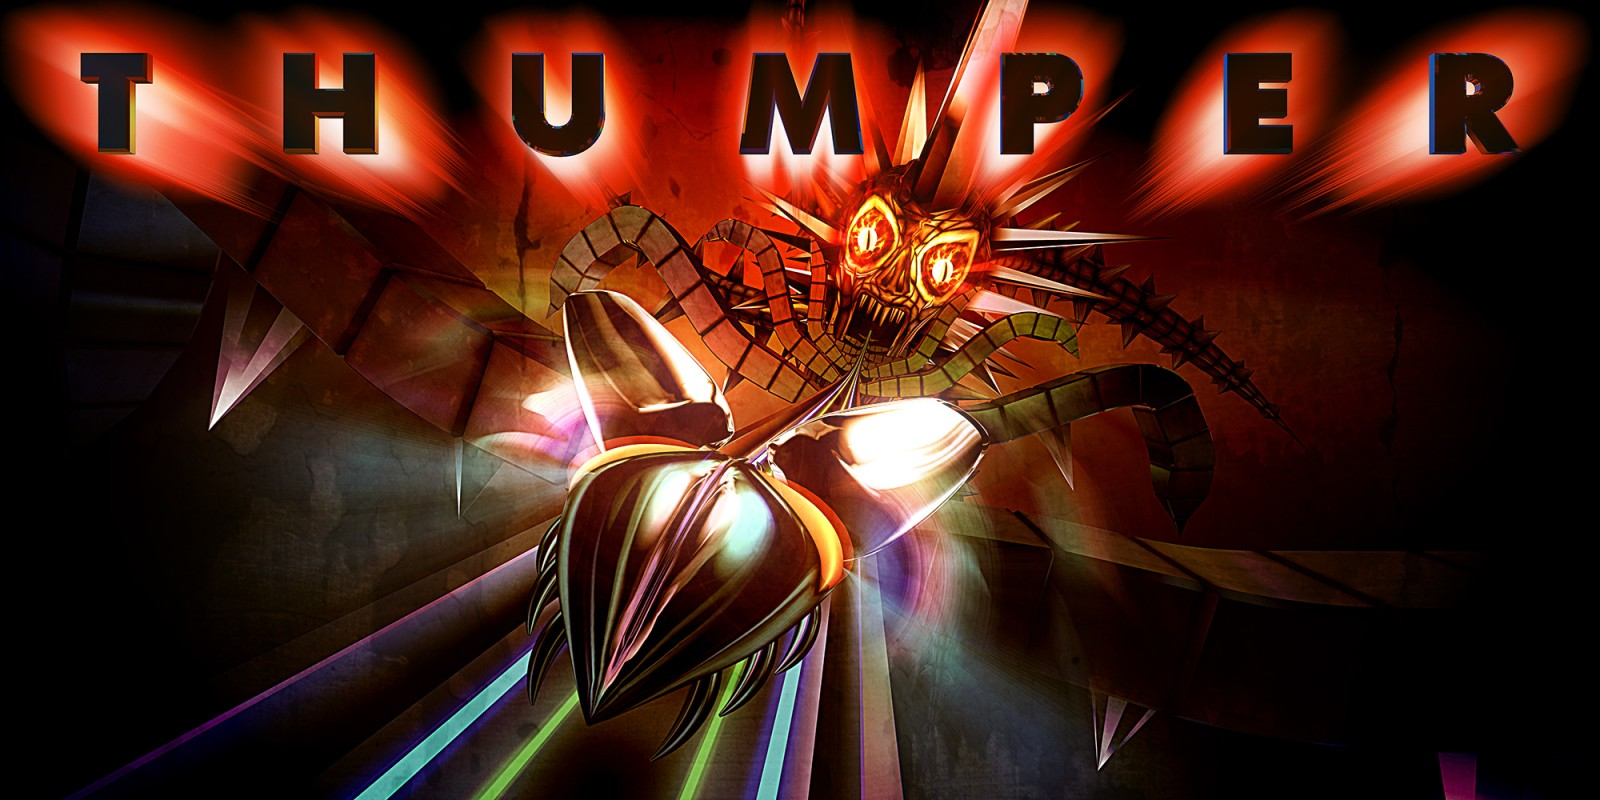 Thumper   Nintendo Switch download software   Games   Nintendo